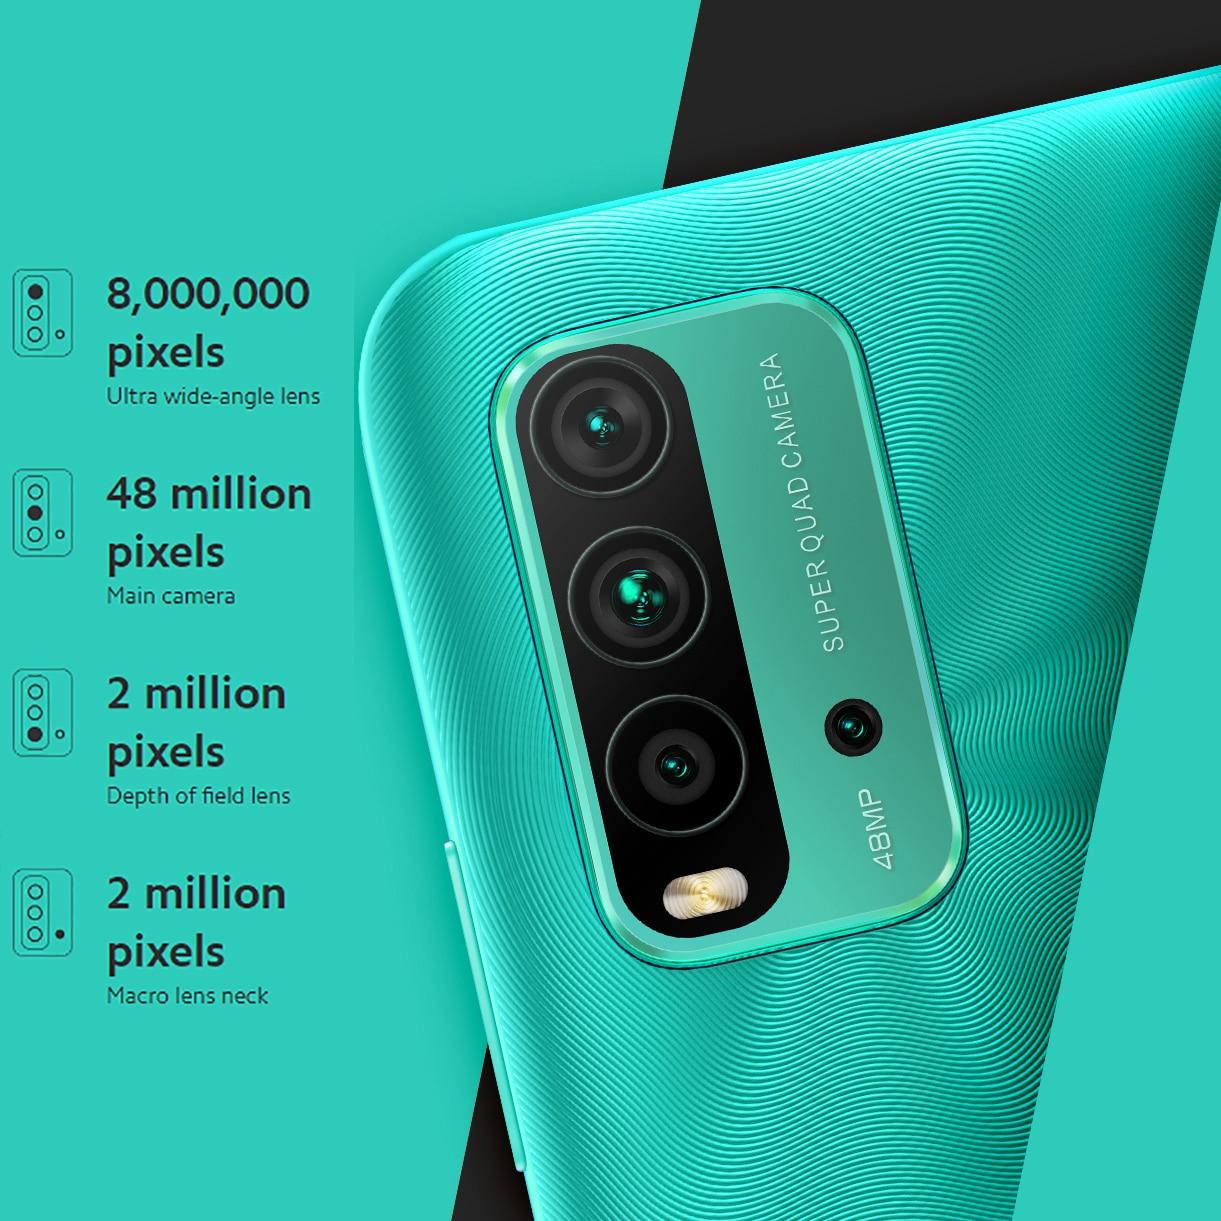 Global Version Xiaomi Redmi 9T 4GB 64GB Smartphone Snapdragon 662 Octa-Core 6.53''FHD Display 48MP 4 Cameras 6000mAh Battery enlarge